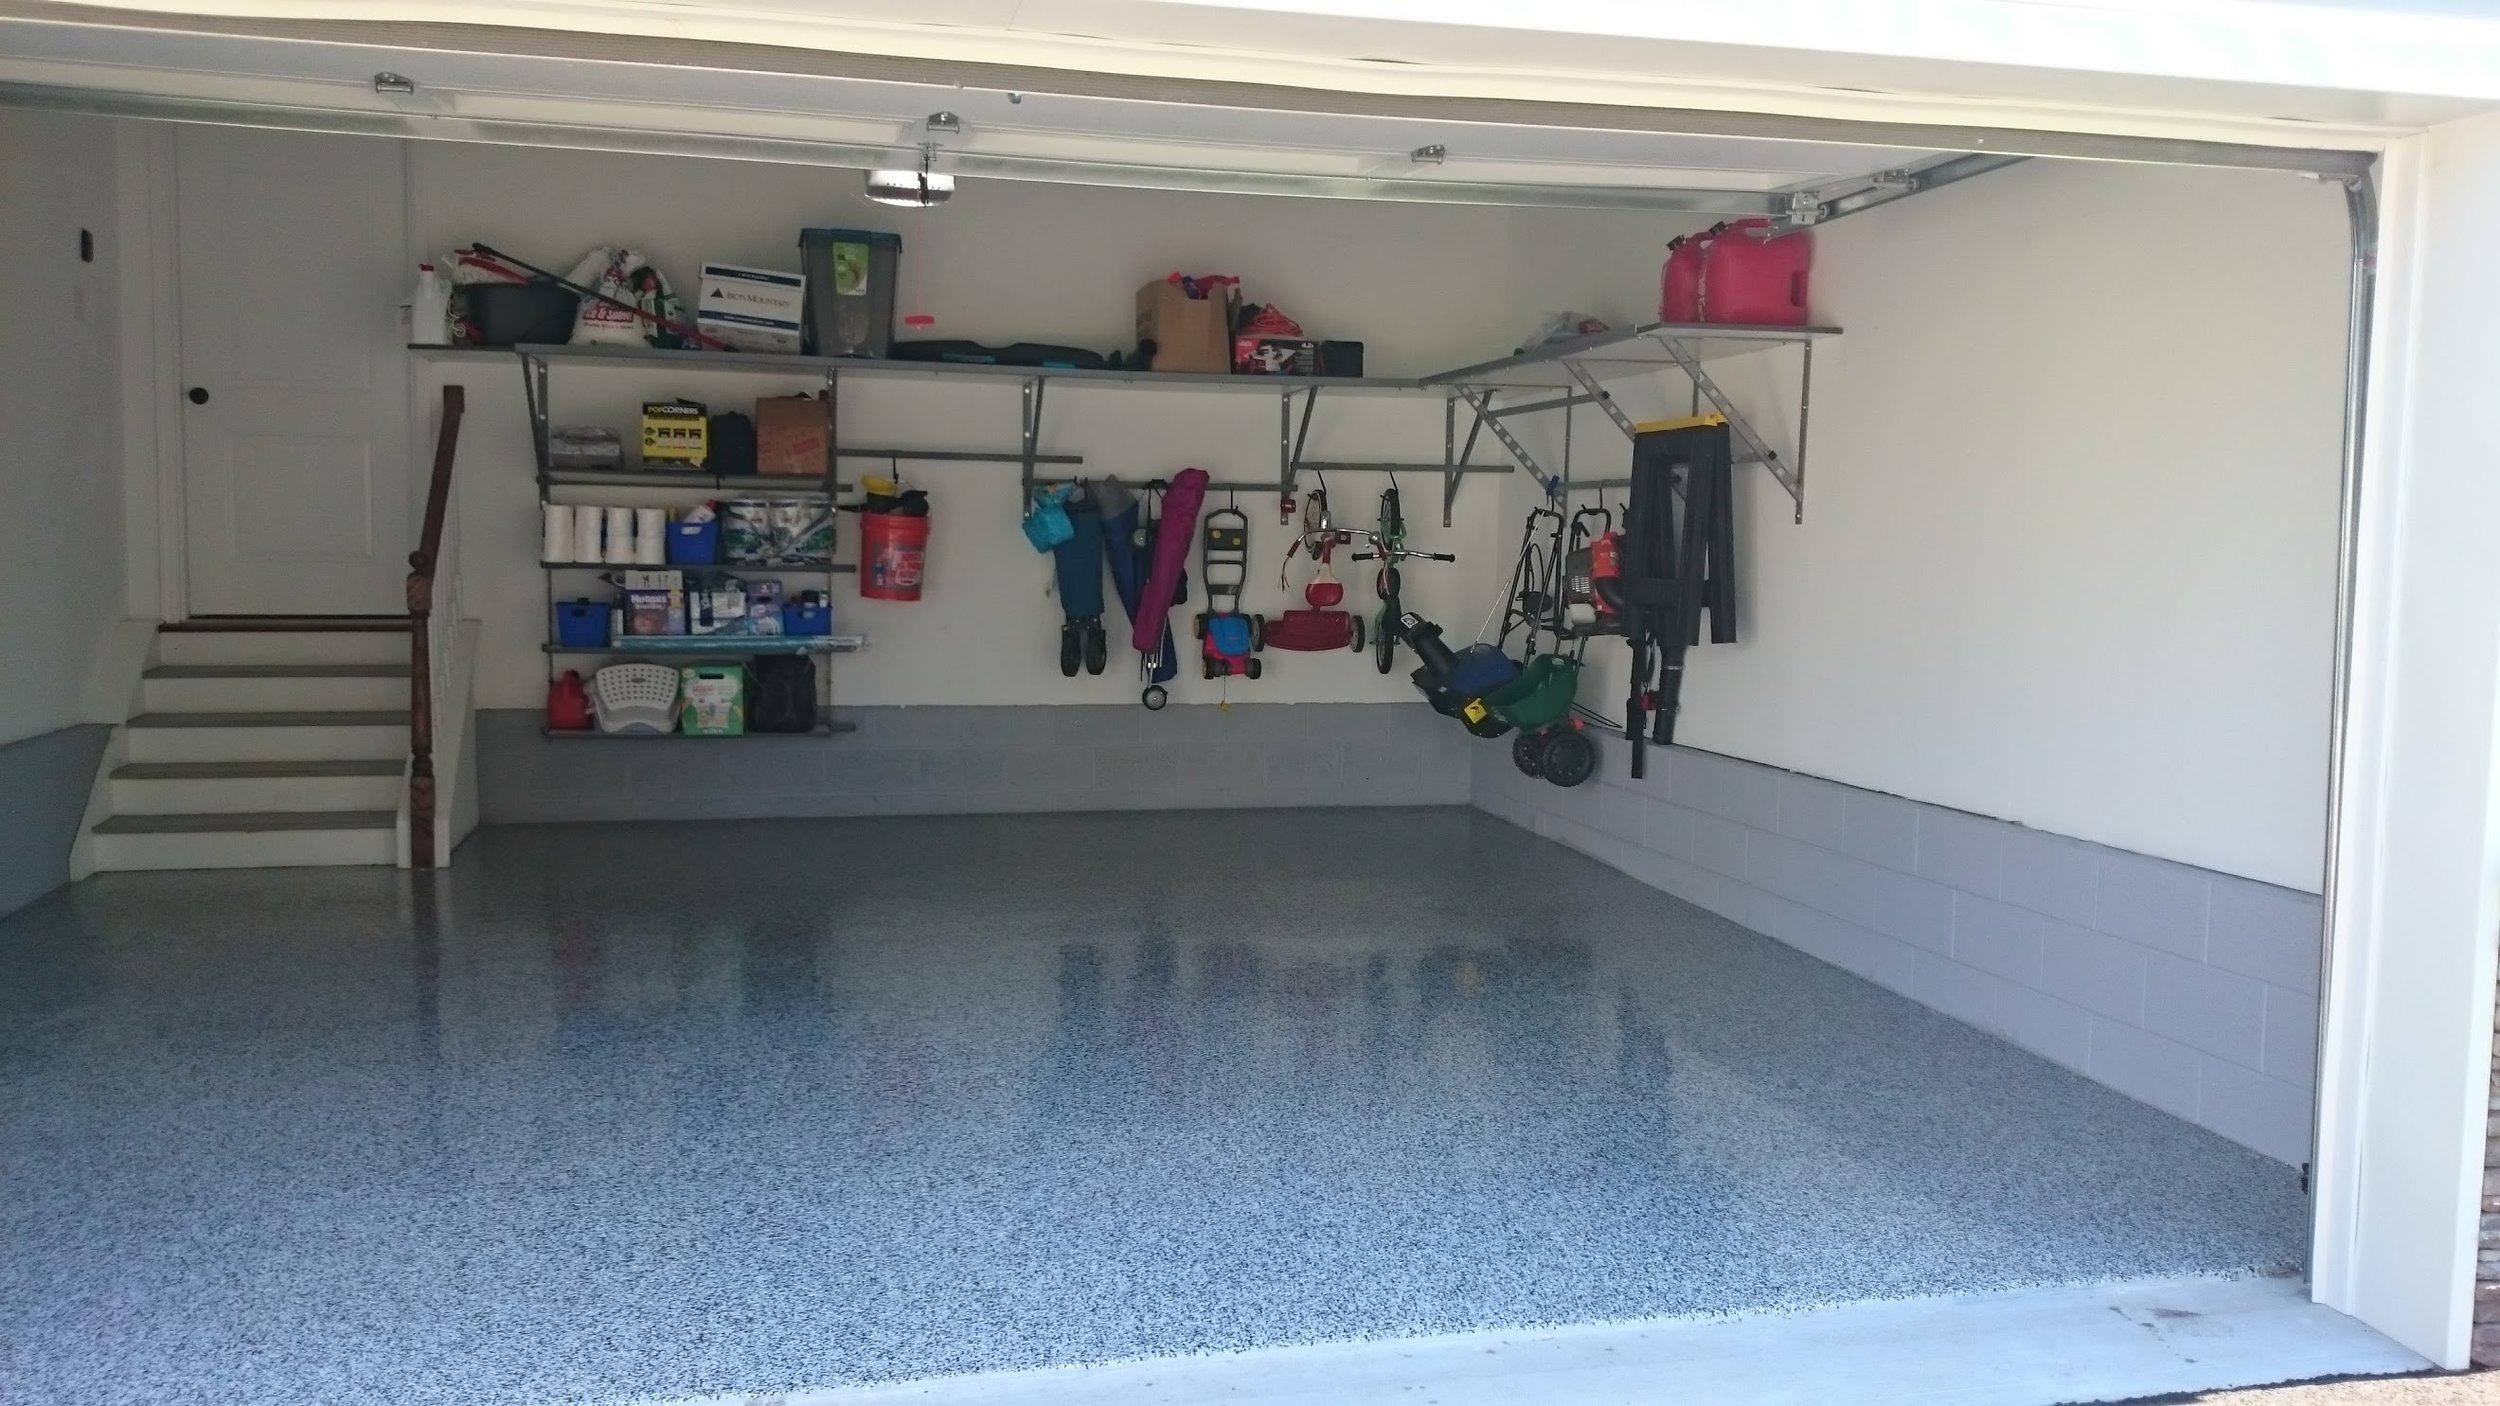 Garage concrete floor with polyurea / POLYASPARTIC coating and shelves with under-shelf adjustable rack storage example